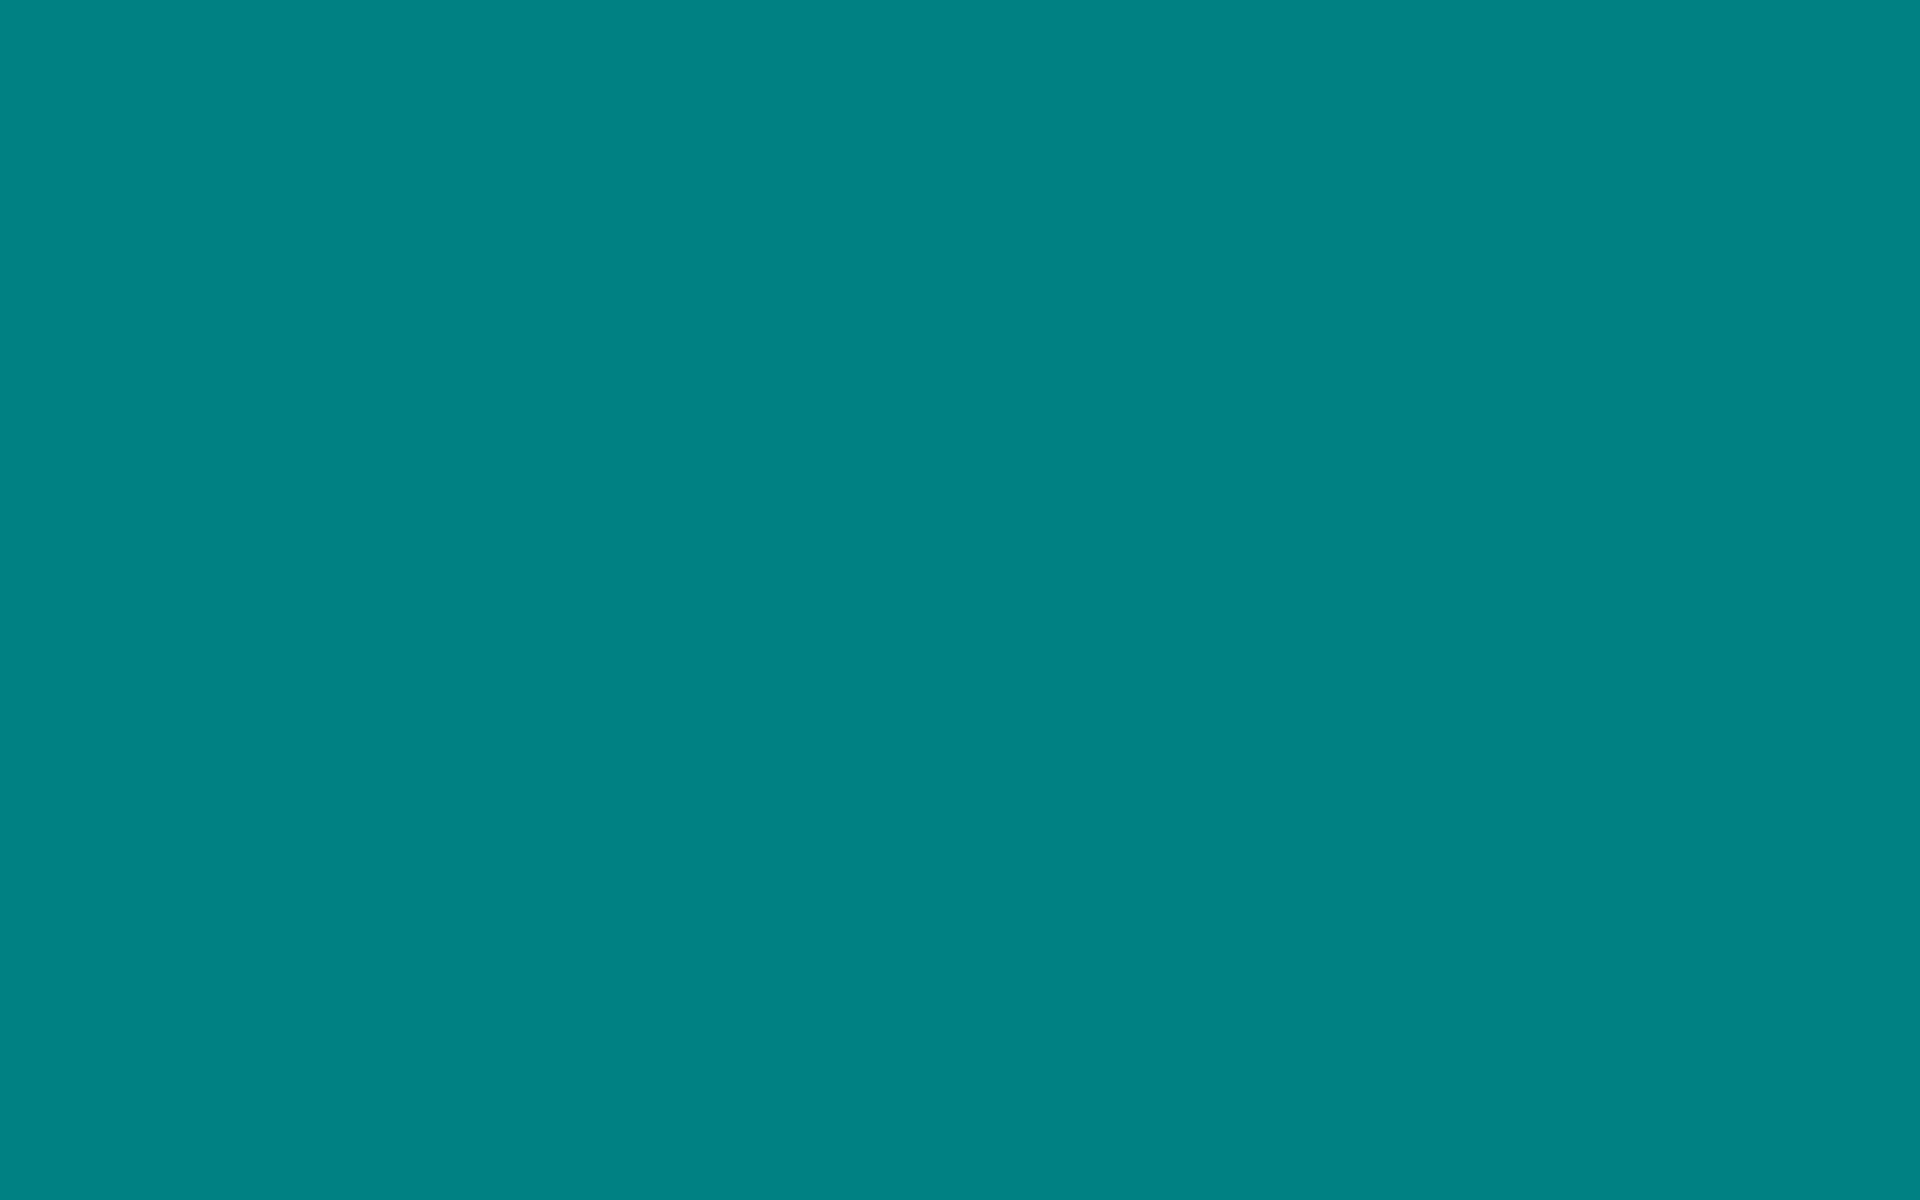 teal solid color wallpaper 49782 51461 hd wallpapersjpg 1920x1200